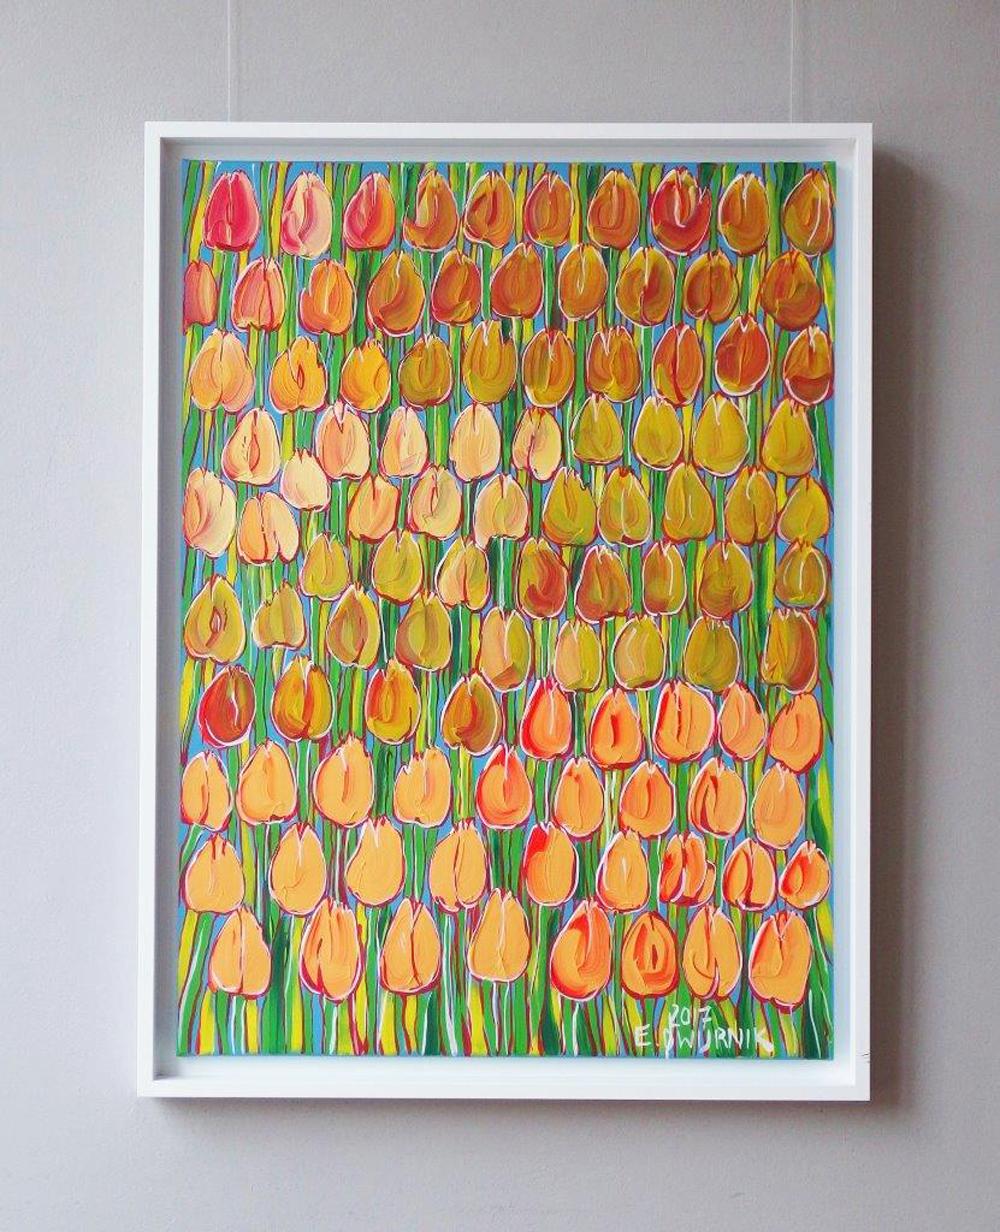 Edward Dwurnik : Only tulips